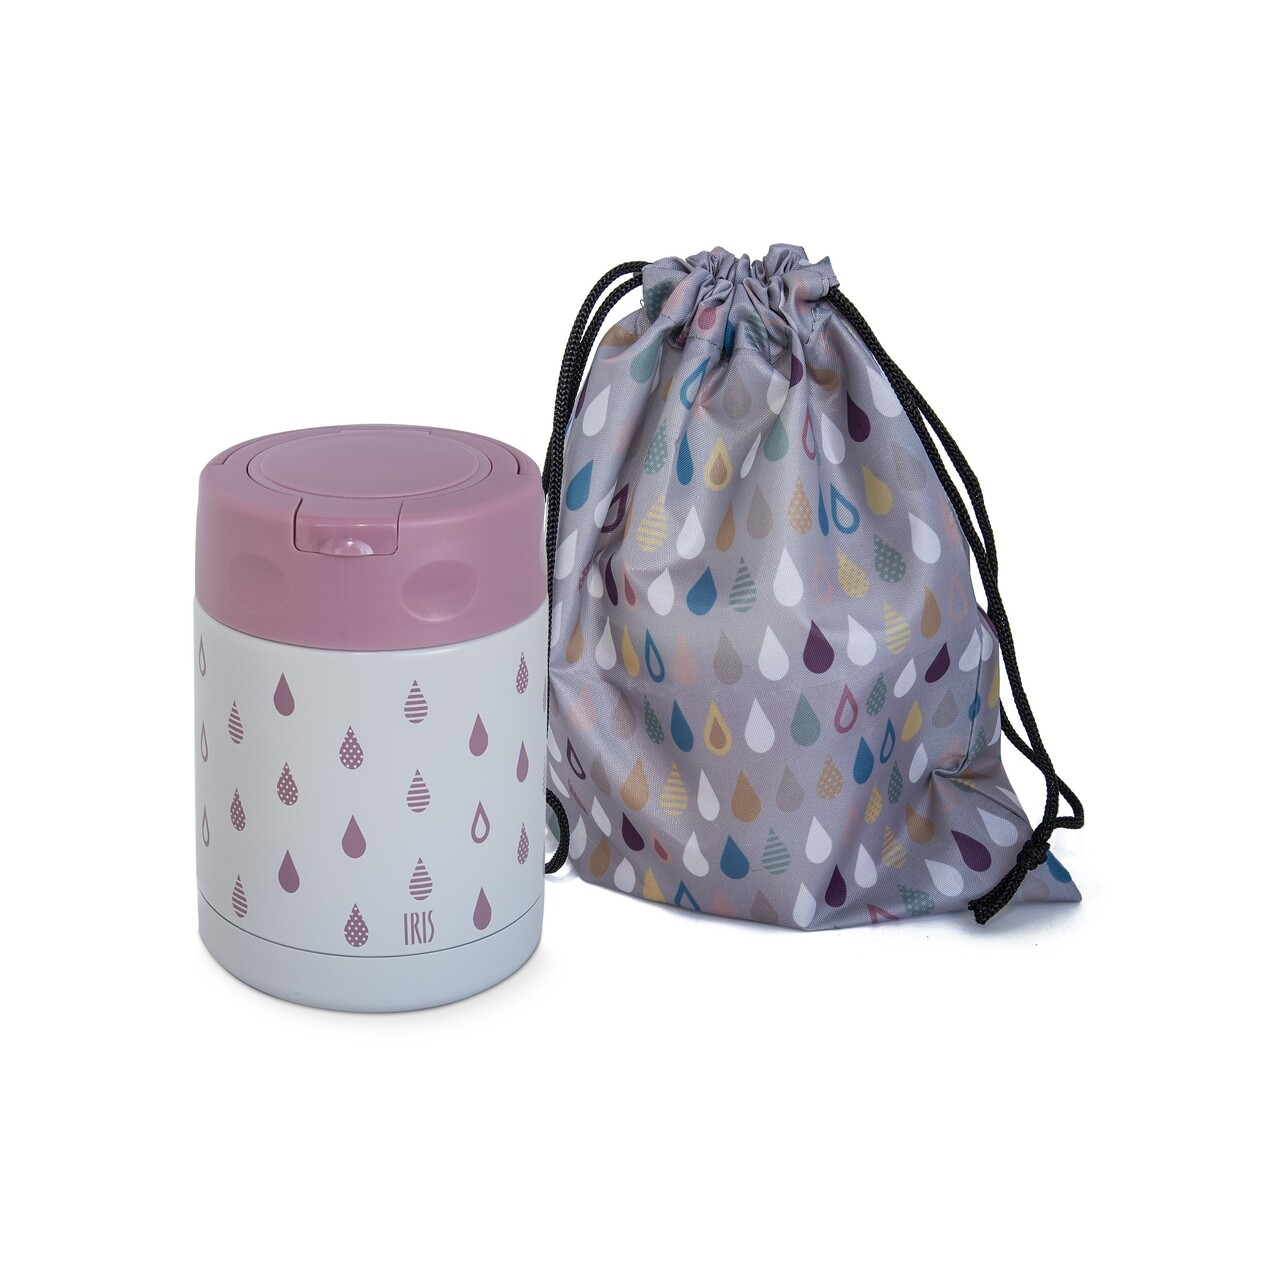 Termos mancare copii + geanta depozitare Drops, Iris Barcelona, 350 ml, pereti dubli, inox, roz